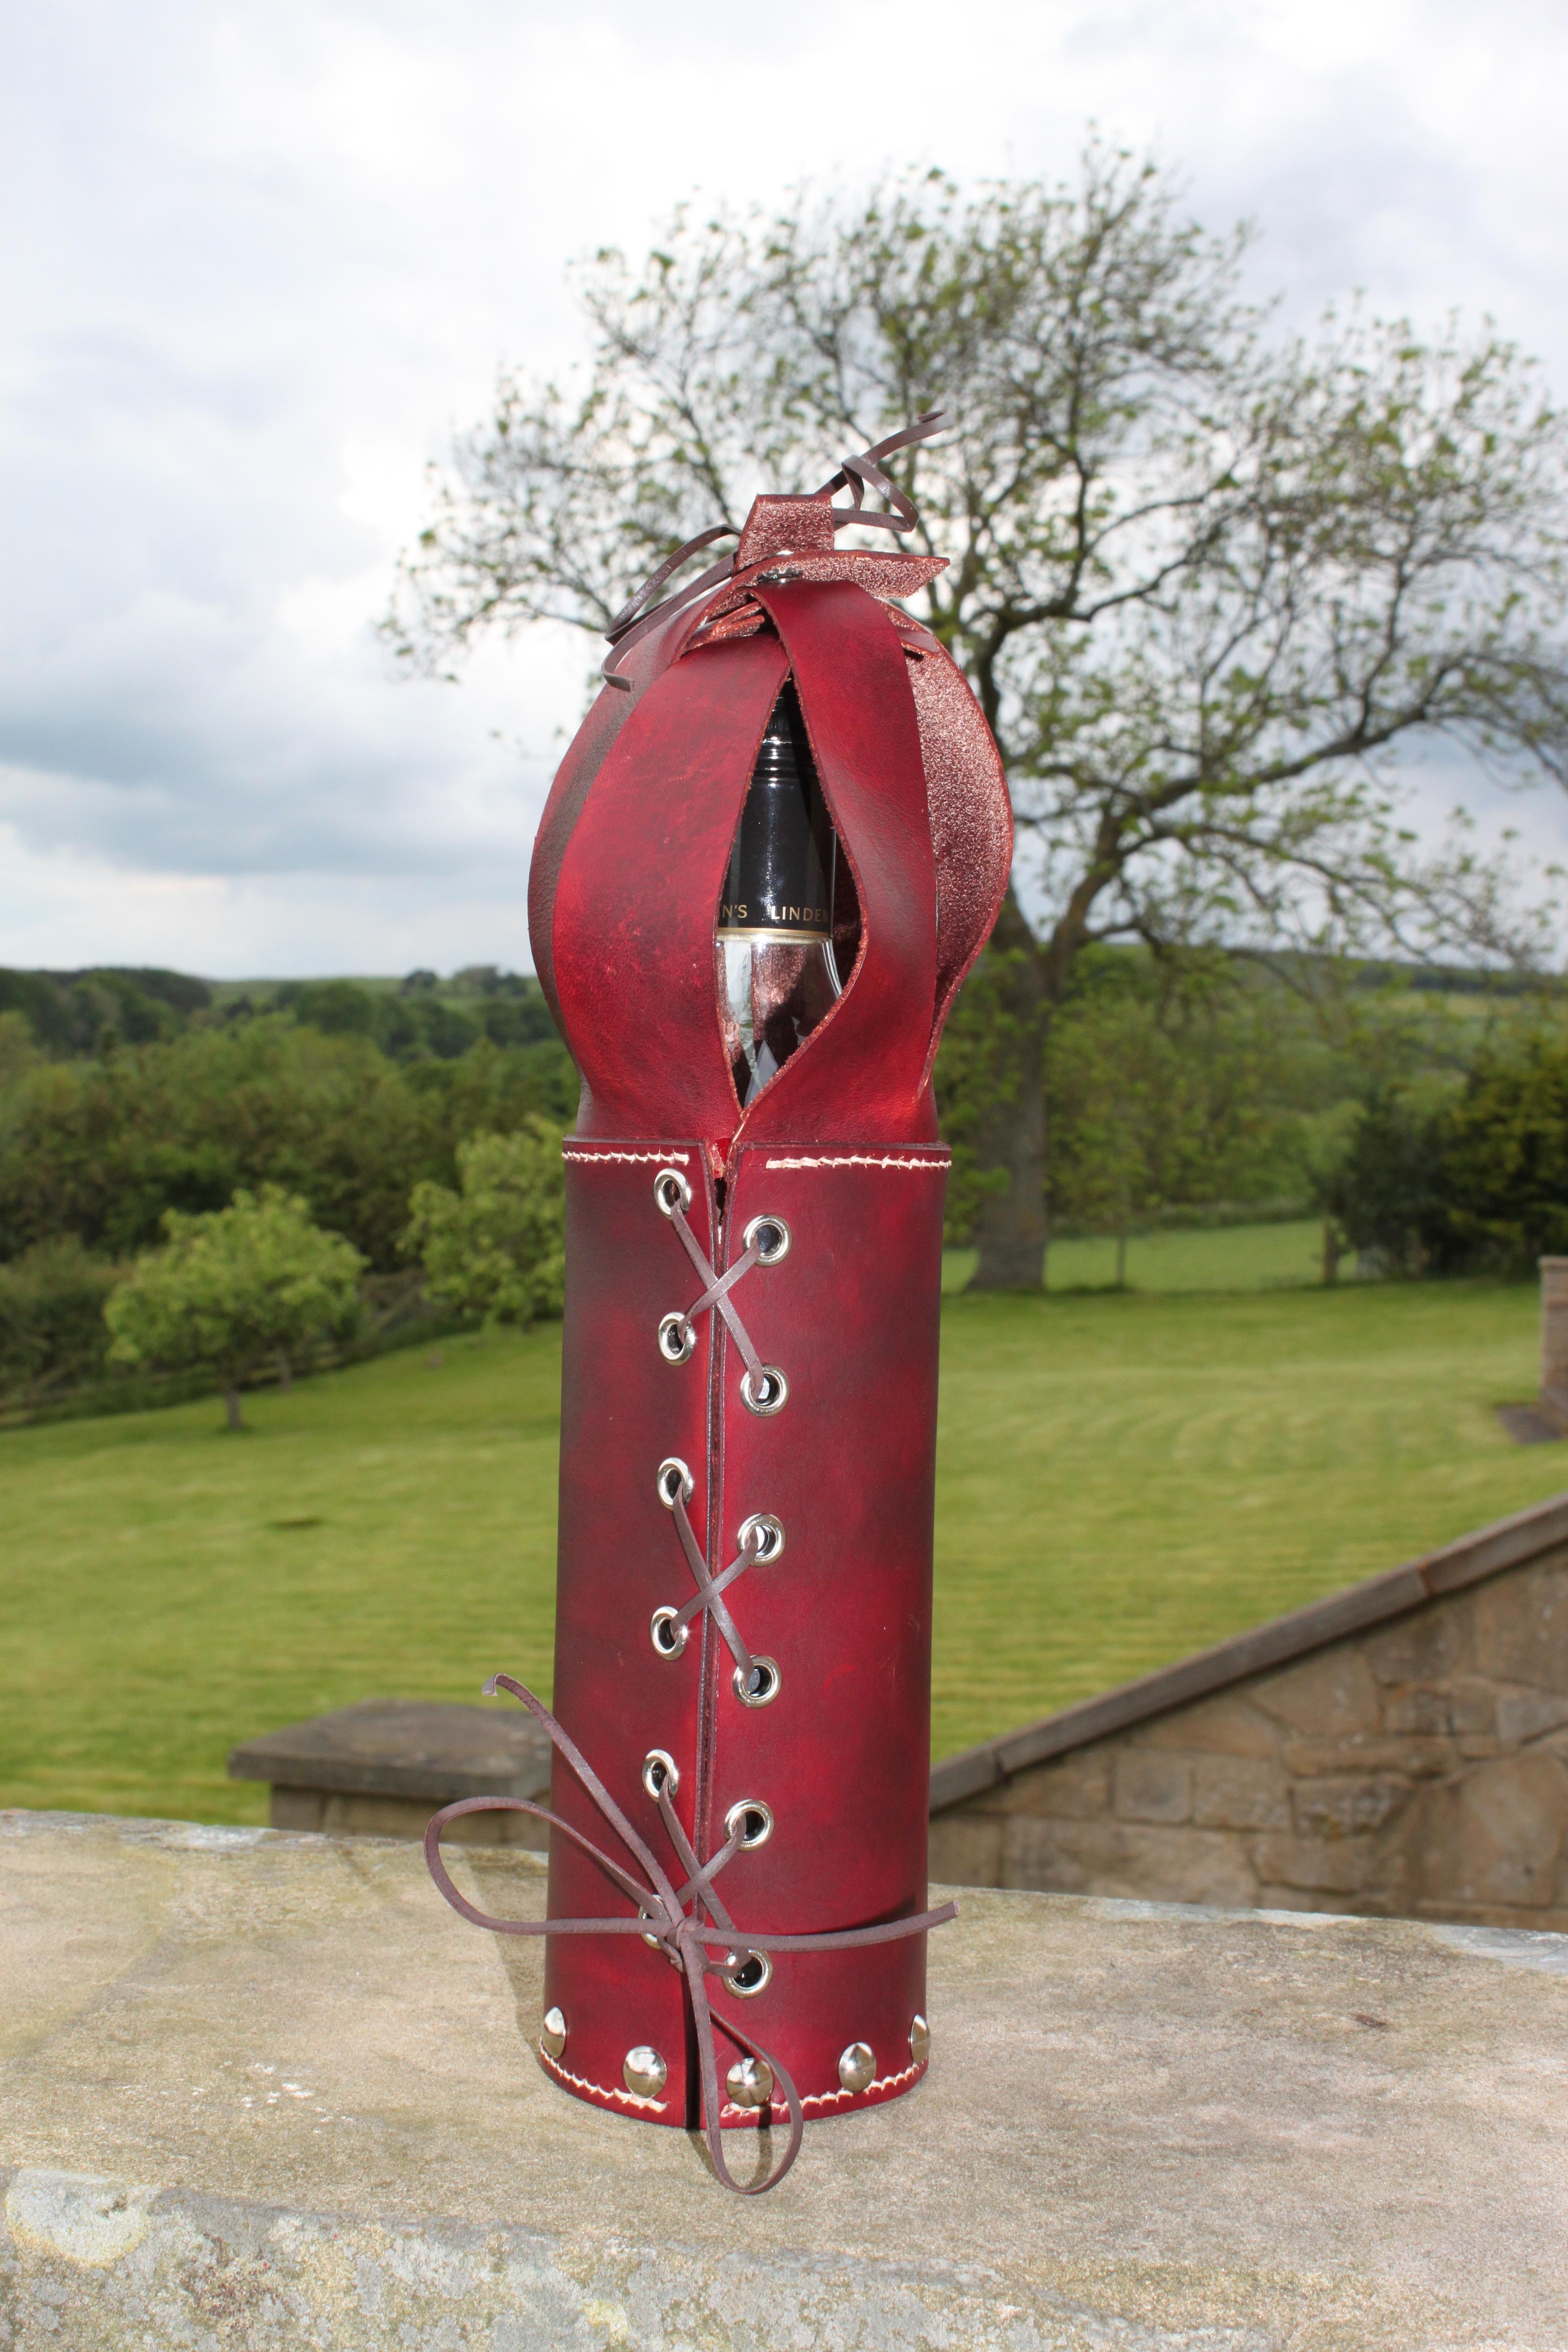 Wine Bottle Presentation Case by Evancliffe Leathercraft